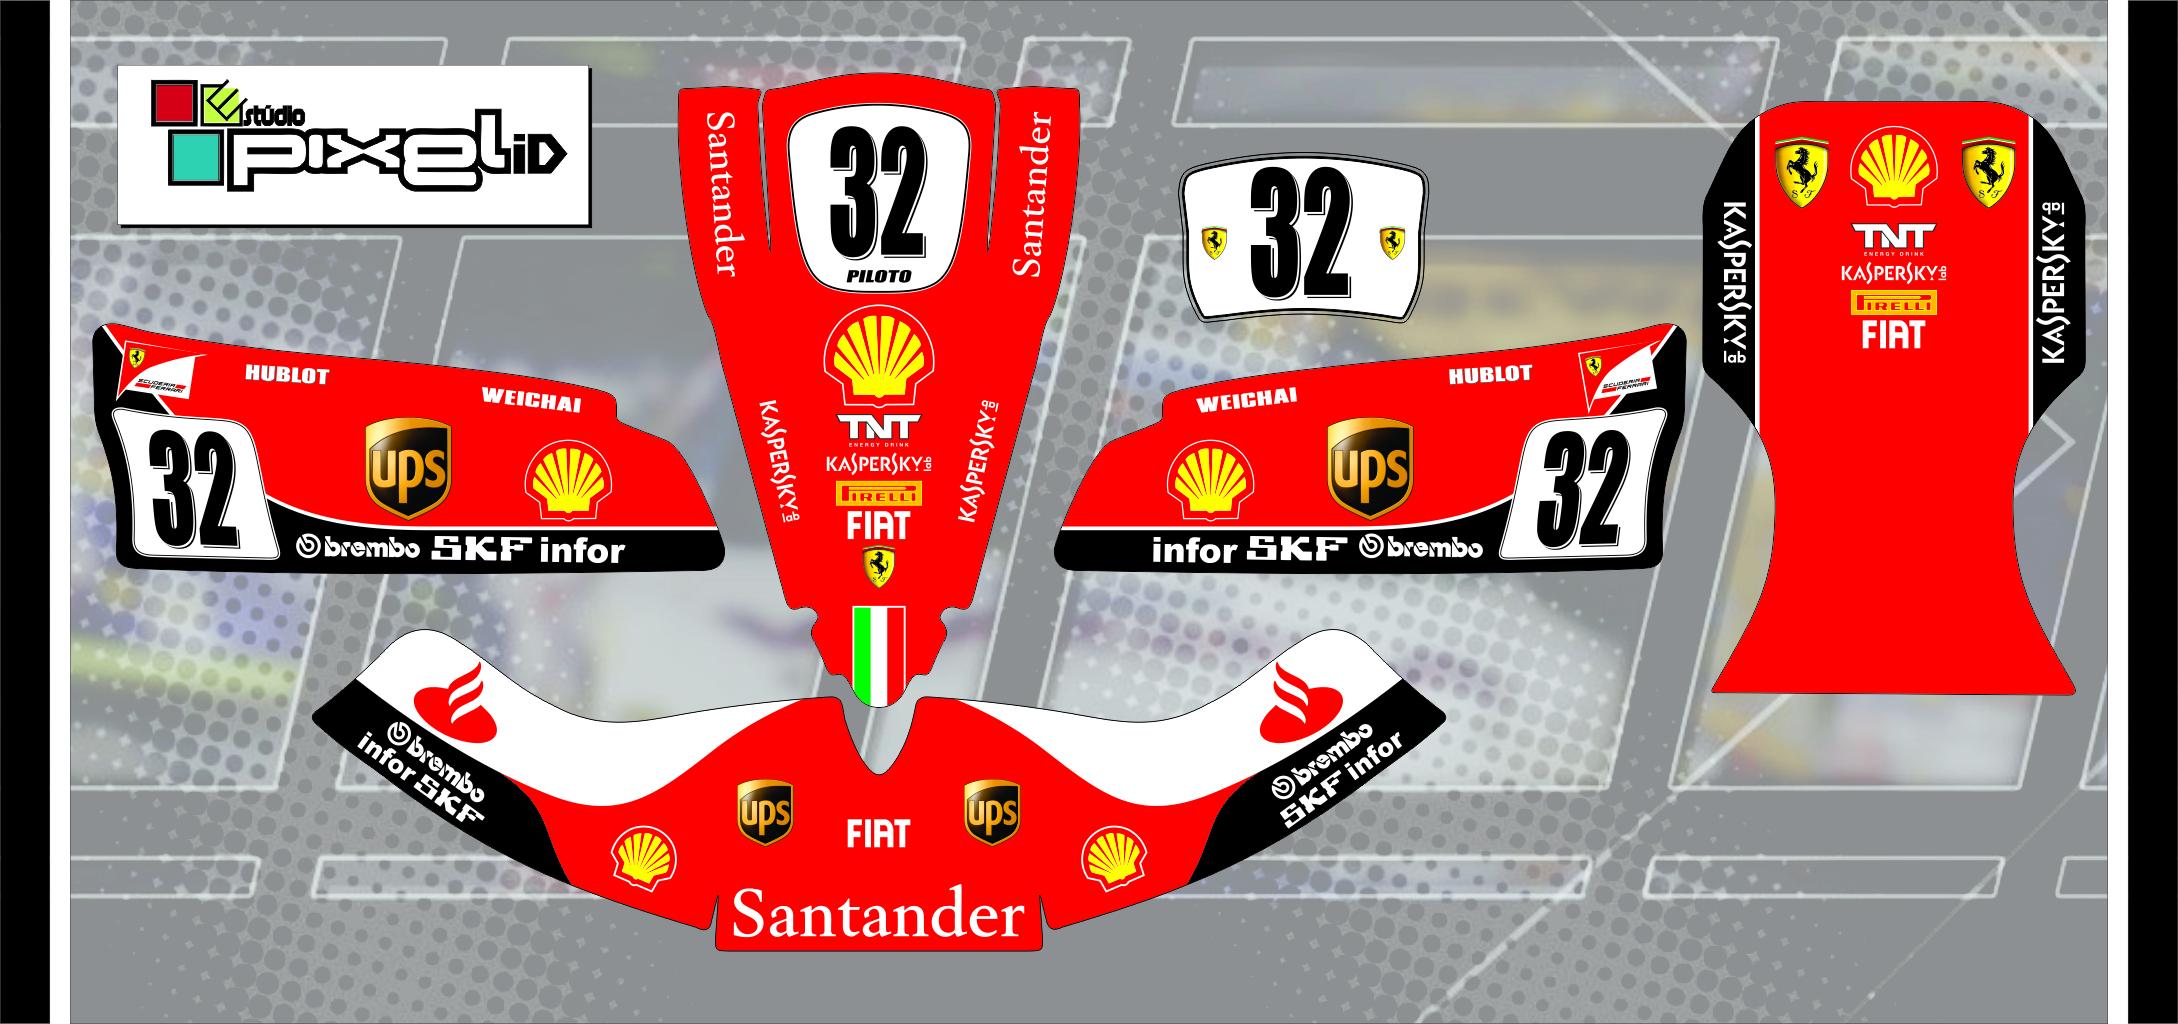 Artesanato Com Papel Origami Passo A Passo ~ Adesivos Kart Réplica Ferrari F1 Adesivos para Kart Estúdio Pixel iD